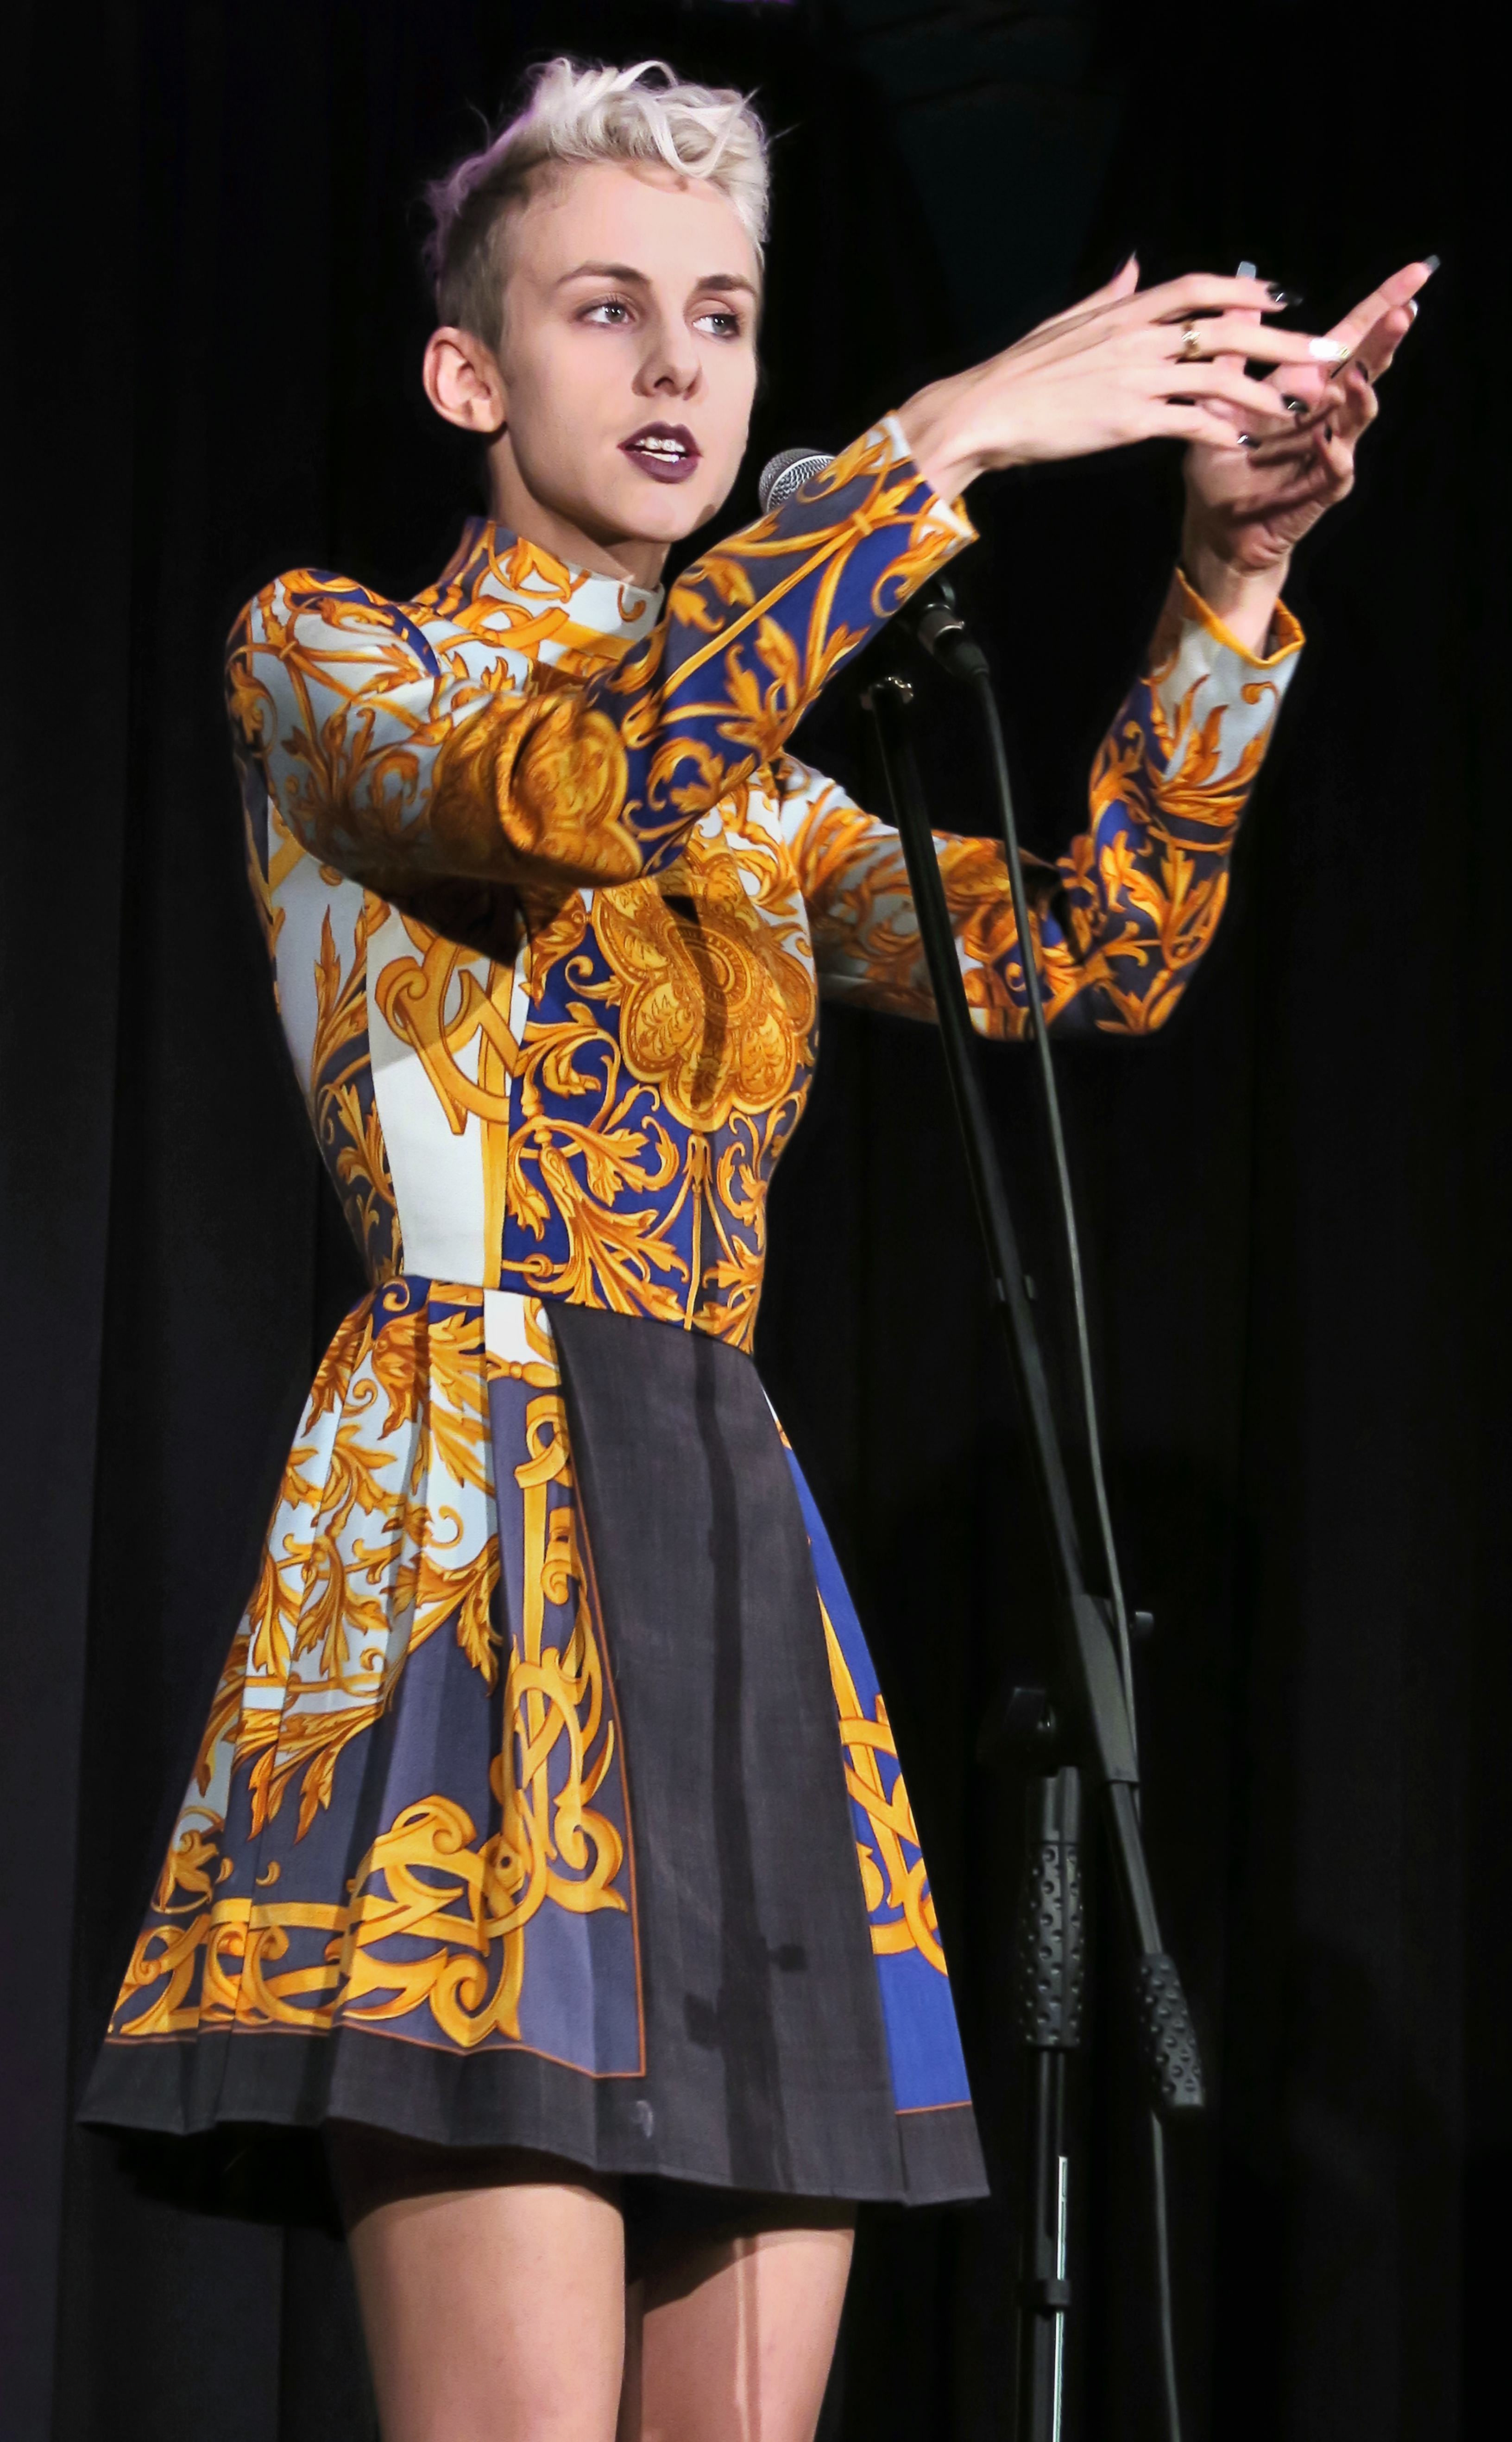 Lisa Eckhart Outfit